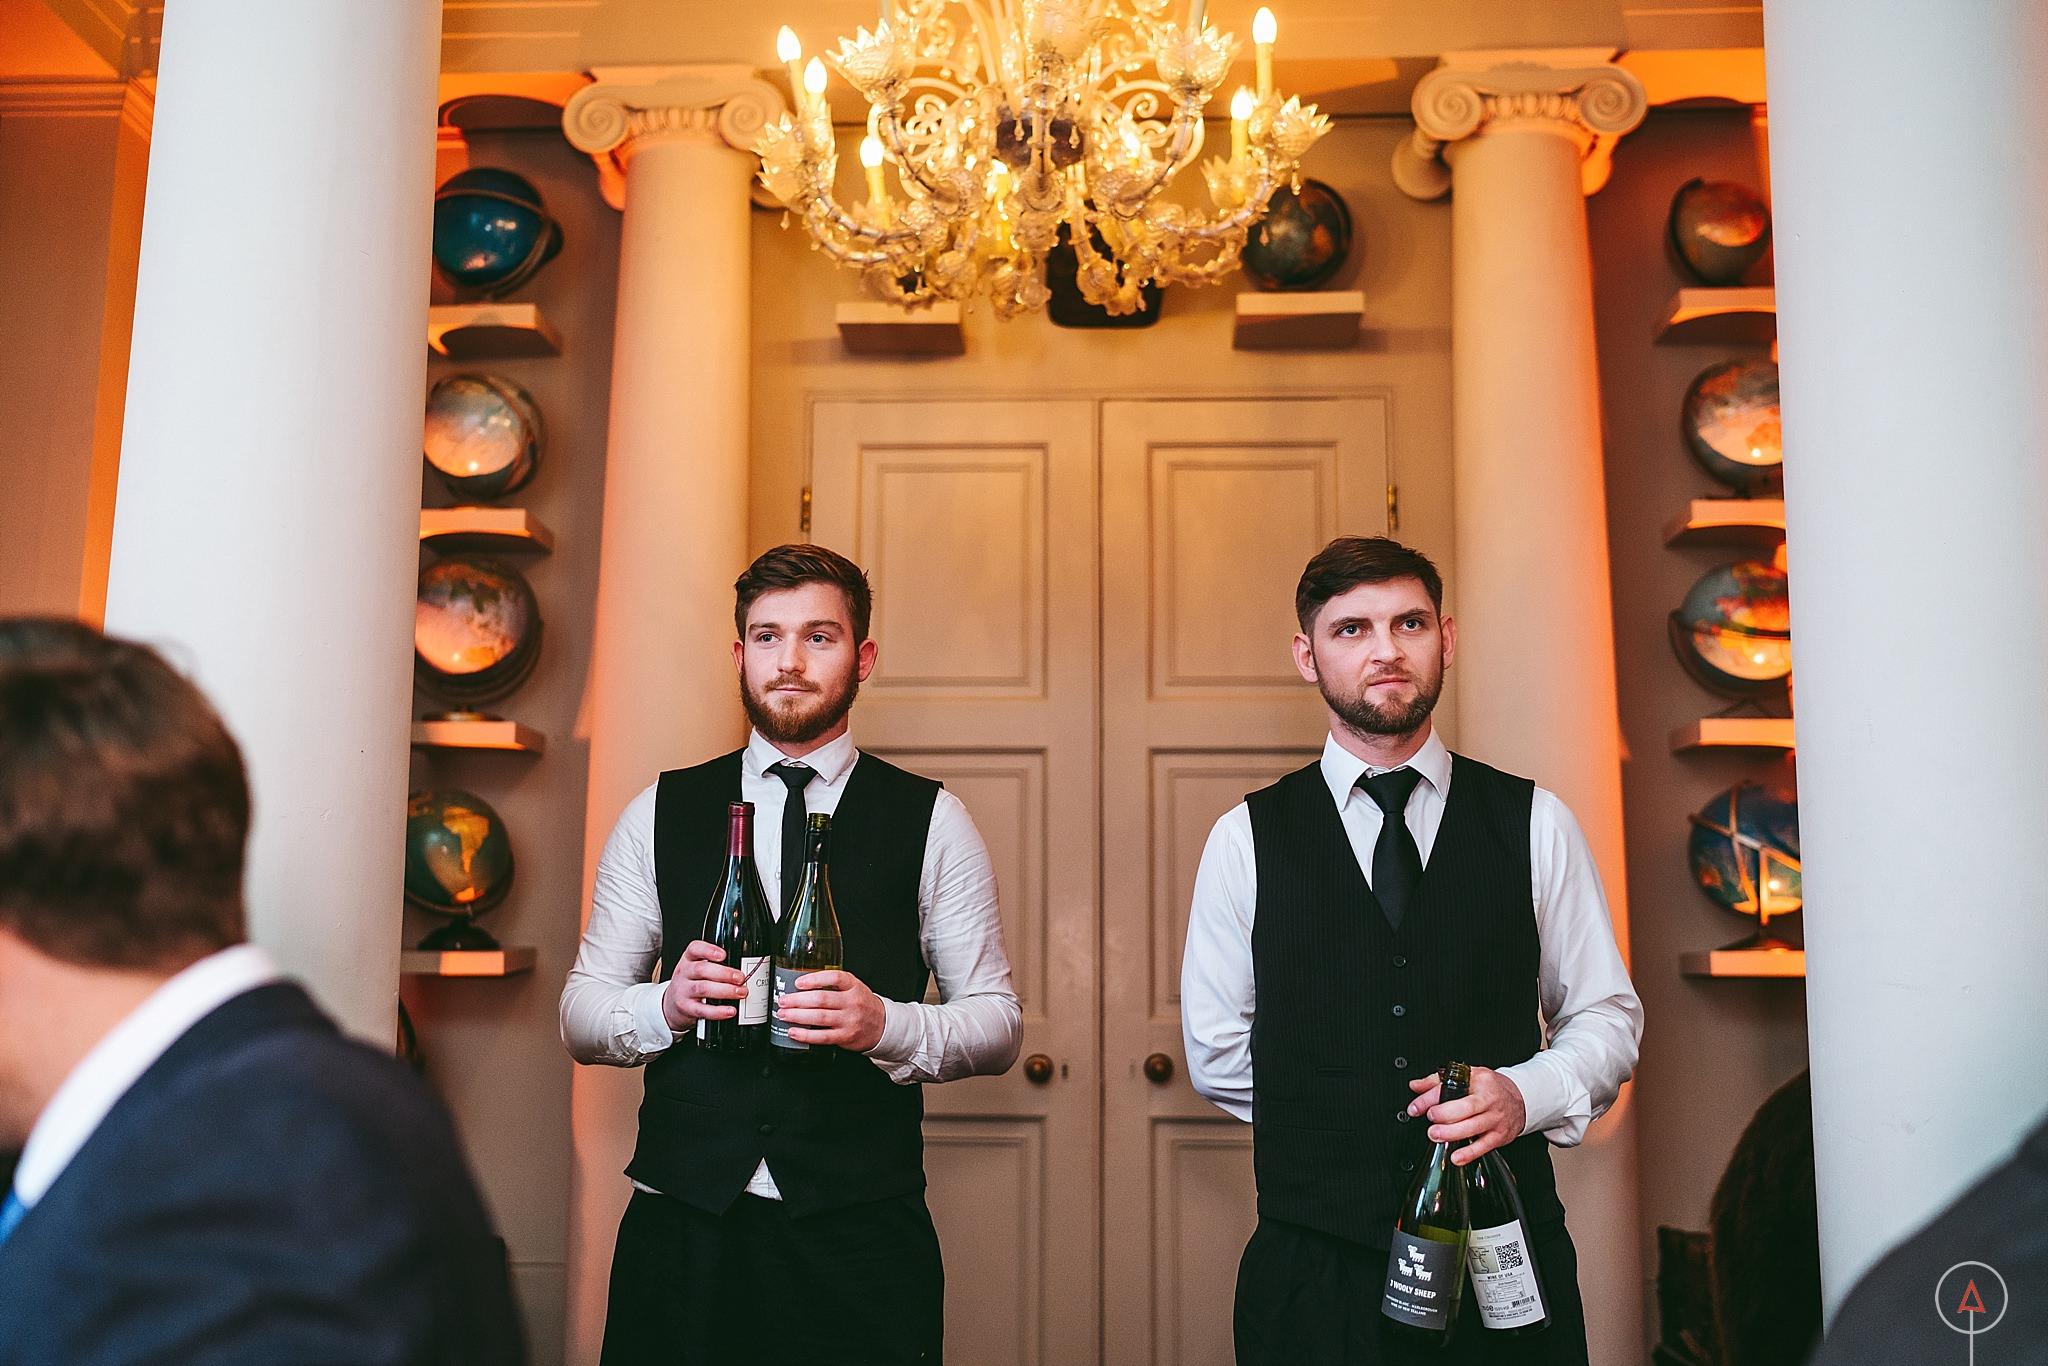 cardiff-wedding-photographer-aga-tomaszek_0305